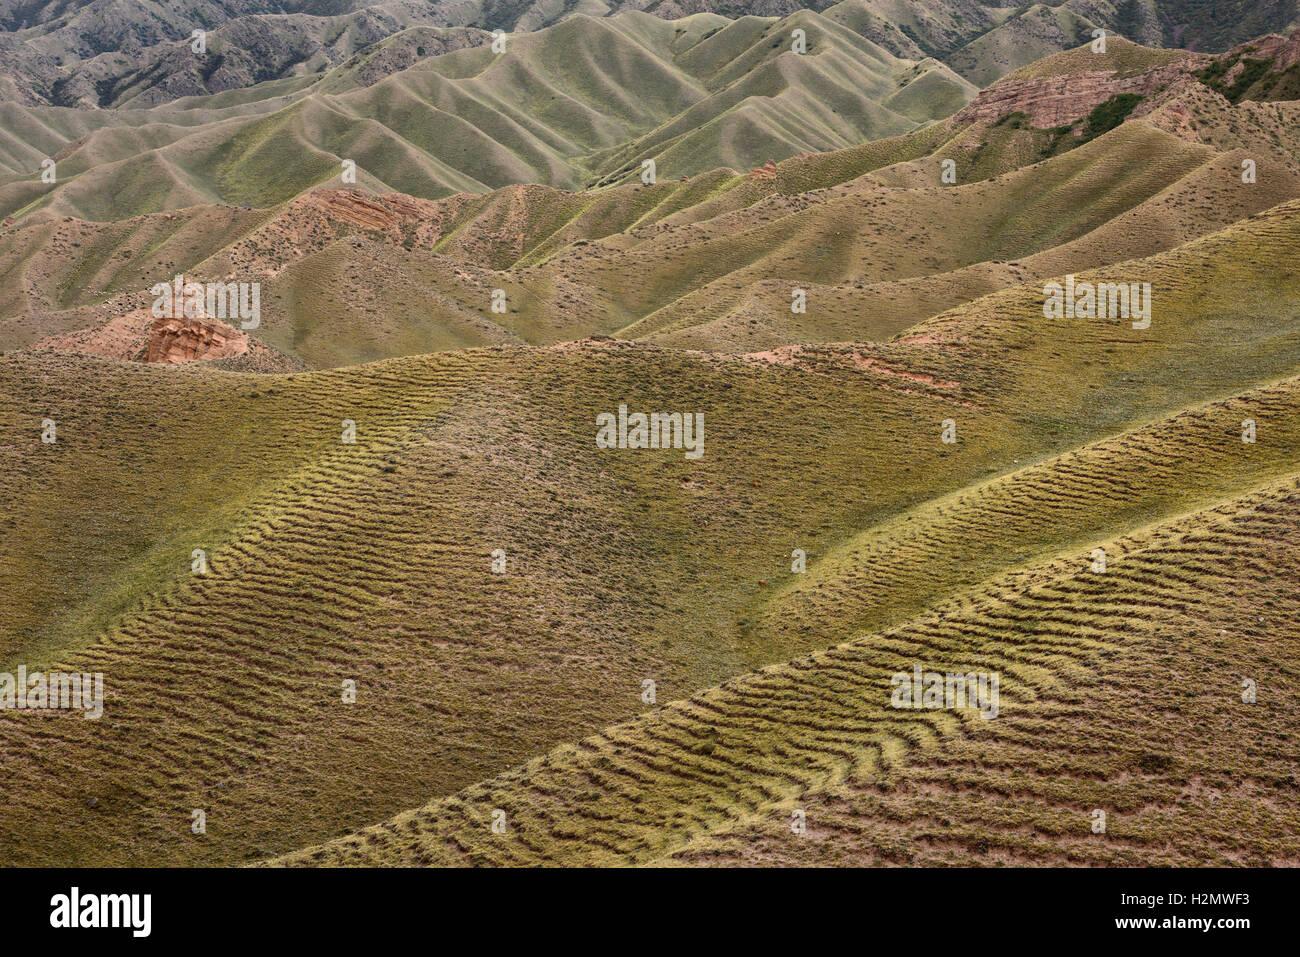 Abstract pastureland hills at Sopka Sarytau mountain east of Assy Plateau Kazakhstan - Stock Image